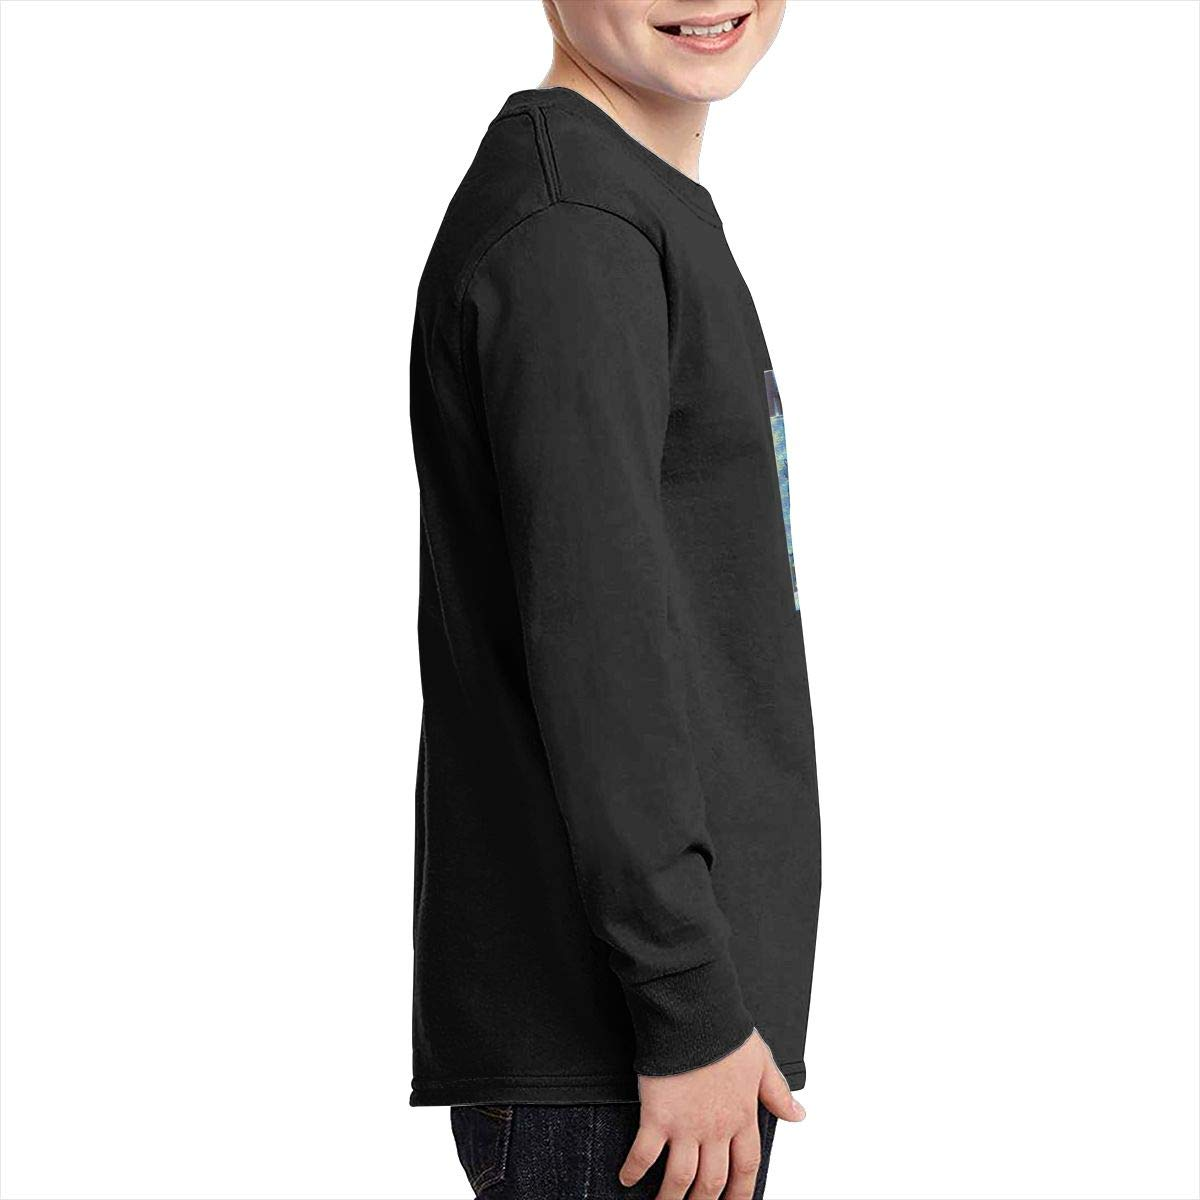 VIERYI Melvins Houdini Hond Logo Rock Band Heren Junior Long Sleeve T-Shirt Boys Korte Mouw Grappige Tee Shirts Black